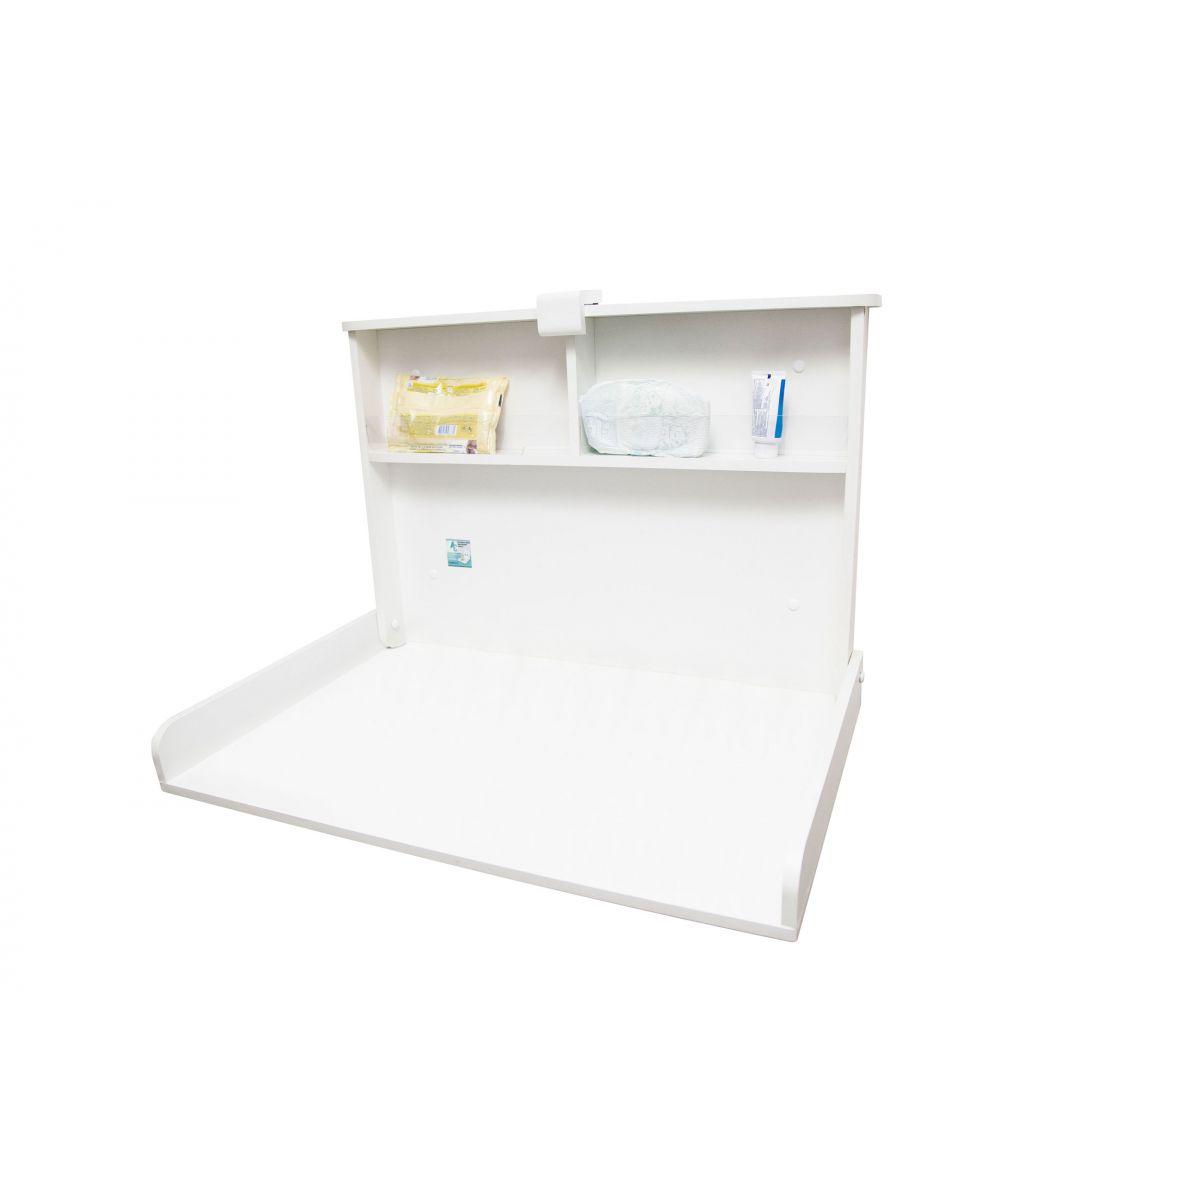 Trocador de Fraldas - Fraldario Ultra Clean Horizontal para fixar na parede